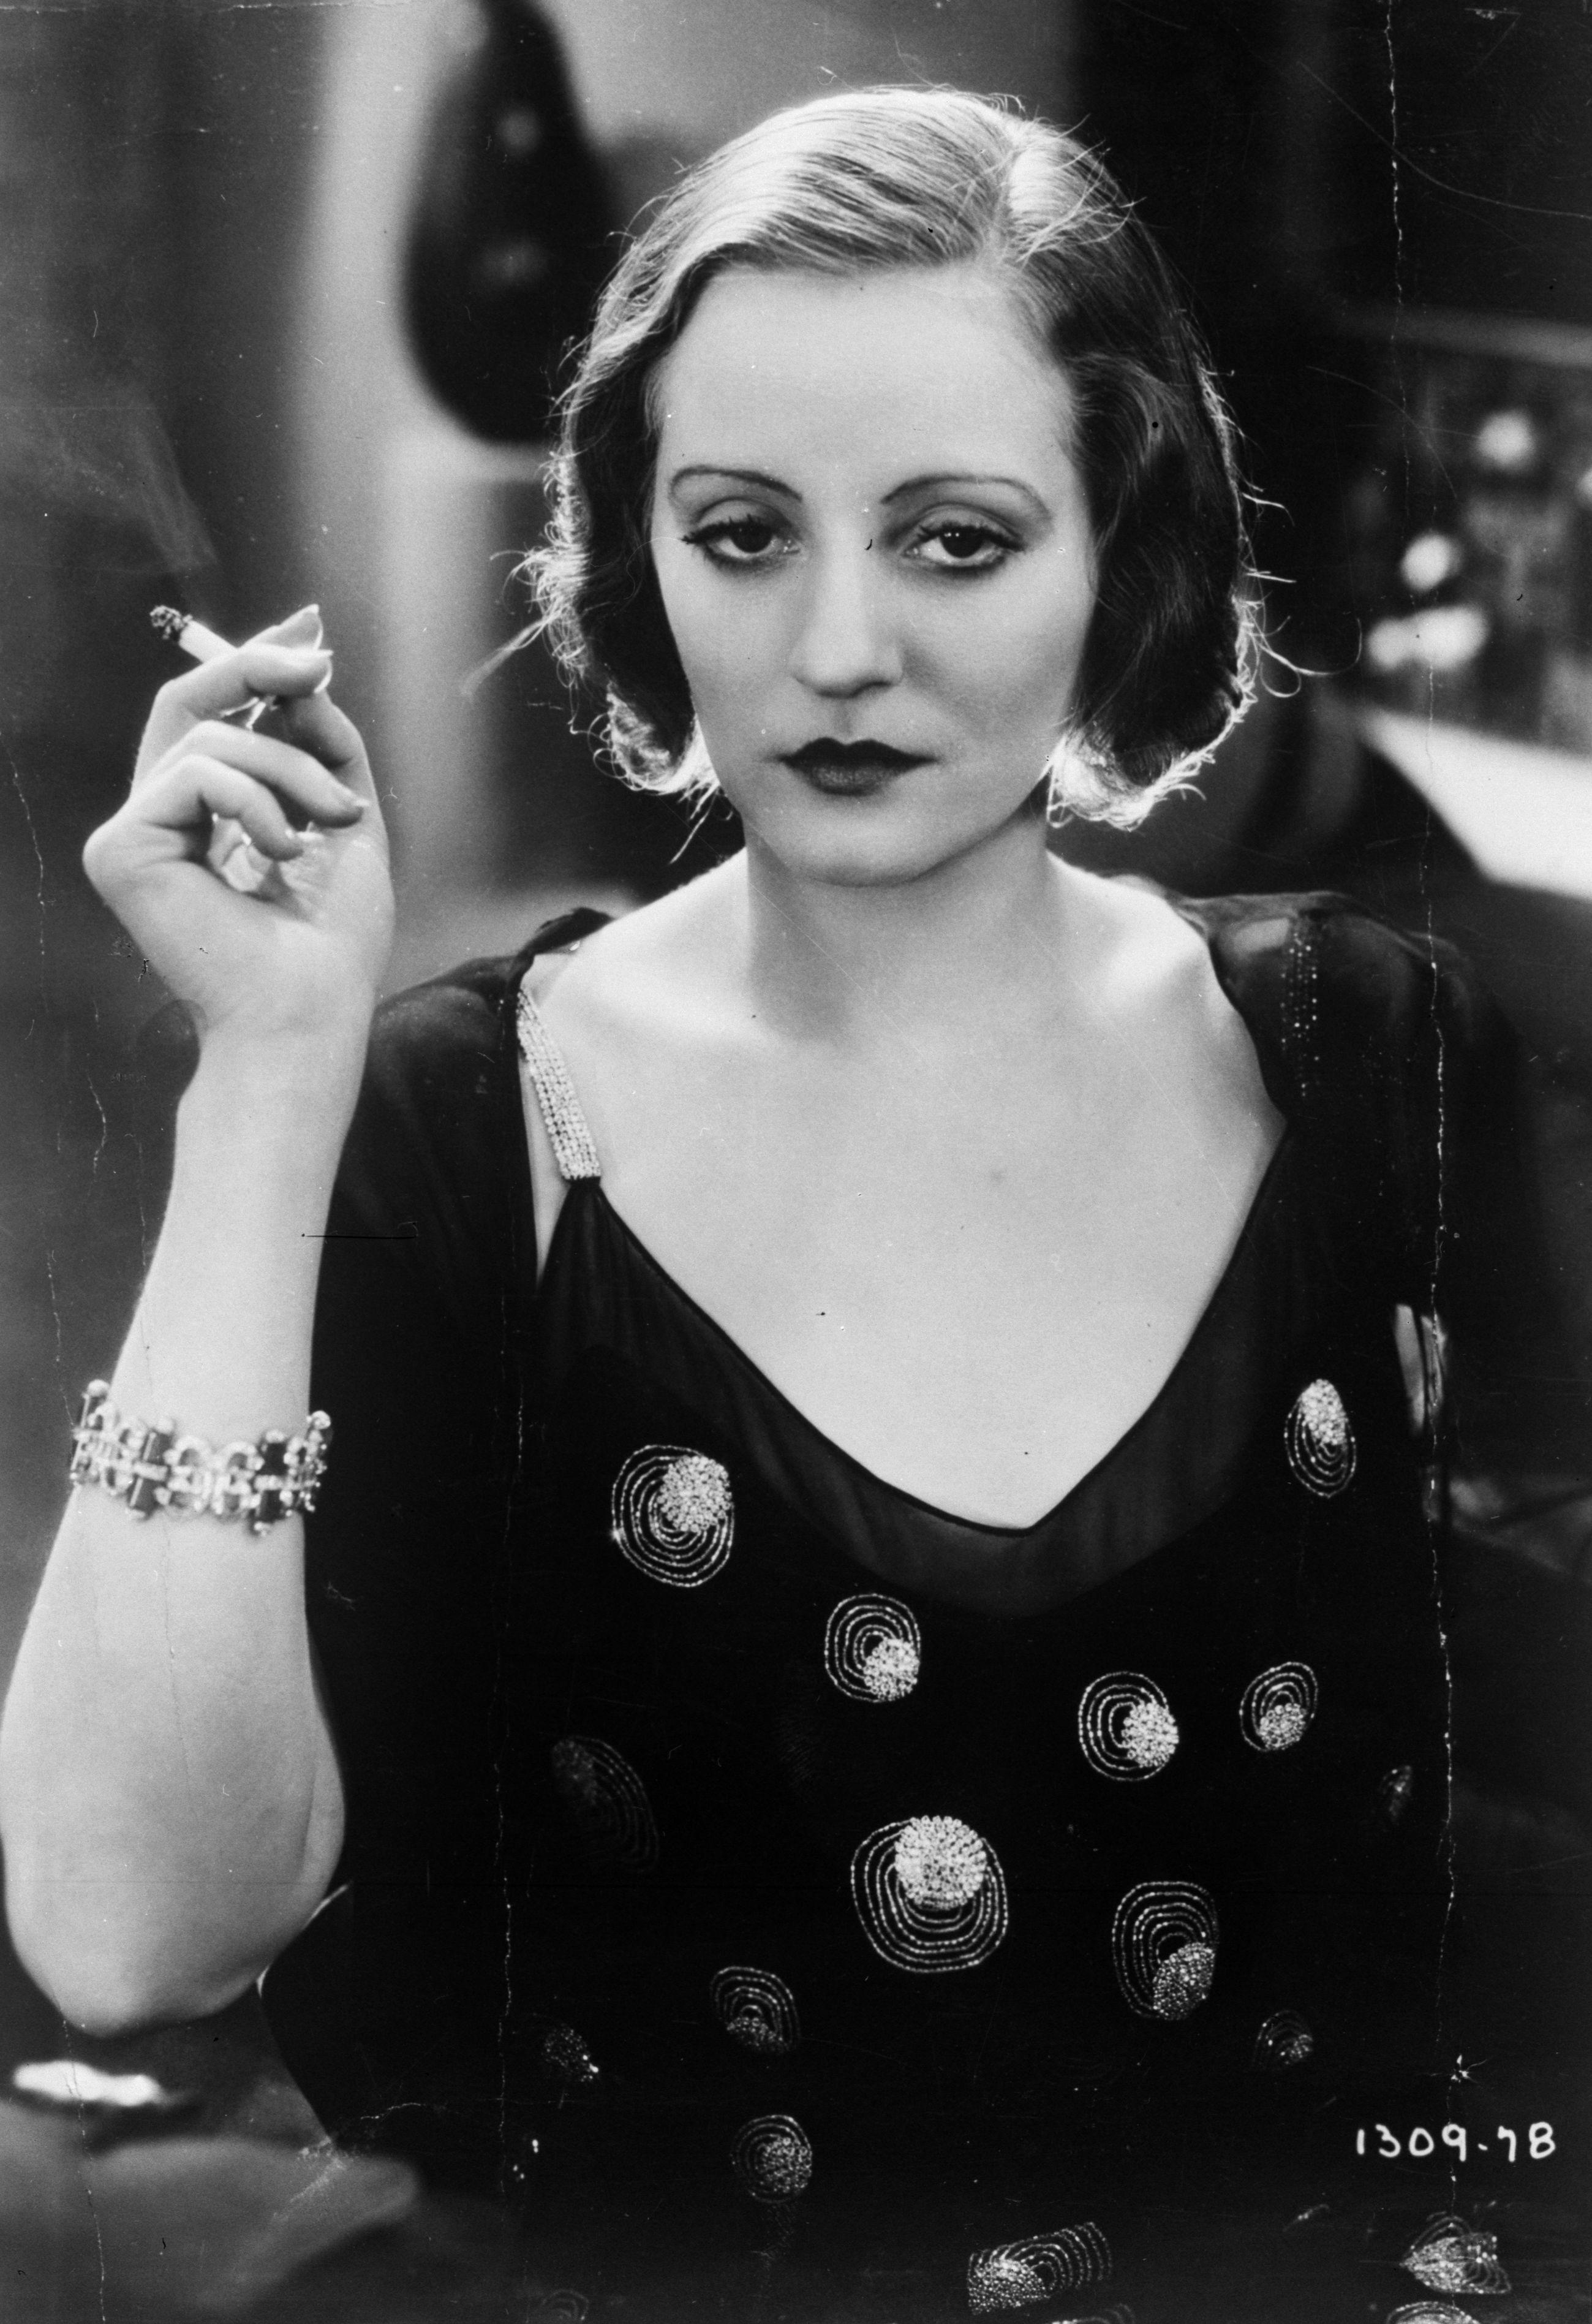 Tallulah Bankhead was said to partially inspire the animated version of Cruella de Vil.